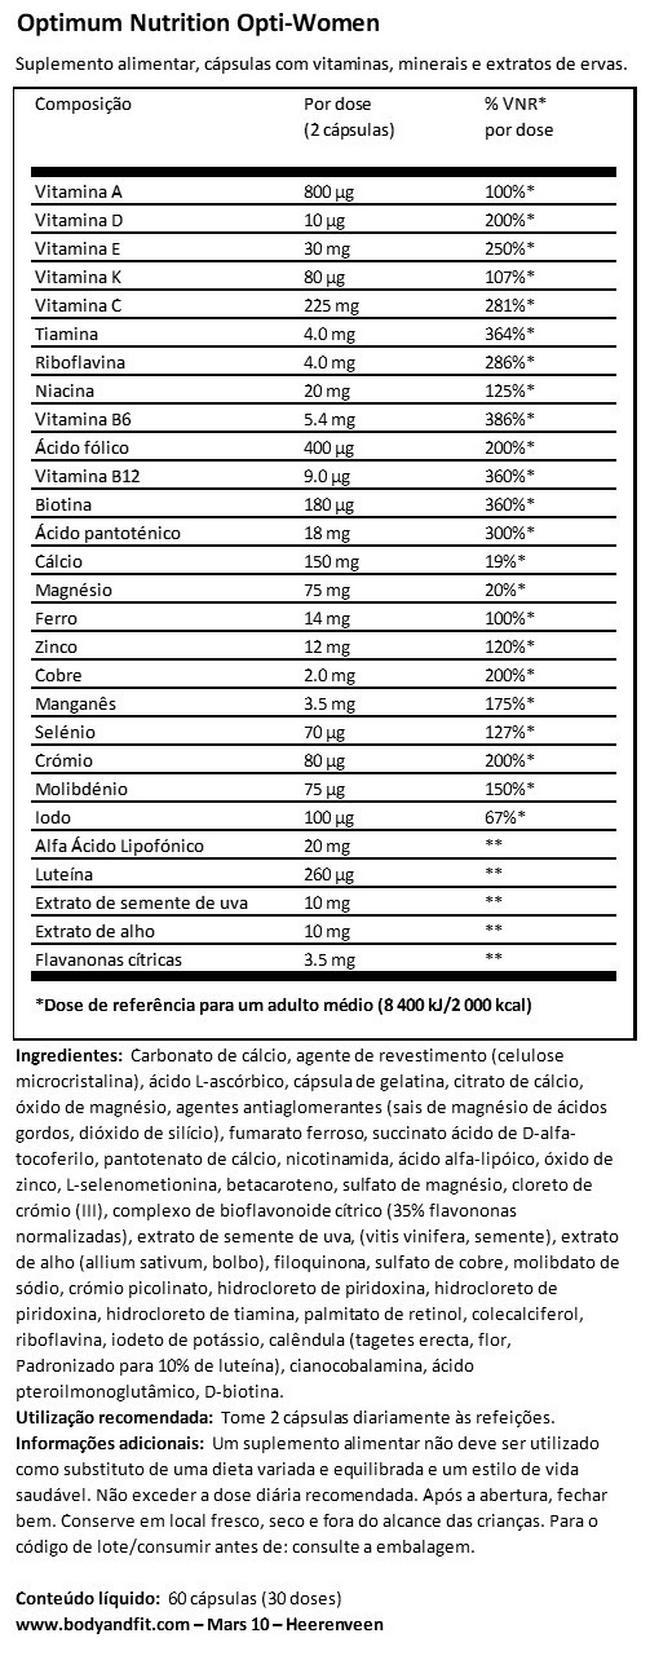 Opti - Women Nutritional Information 1